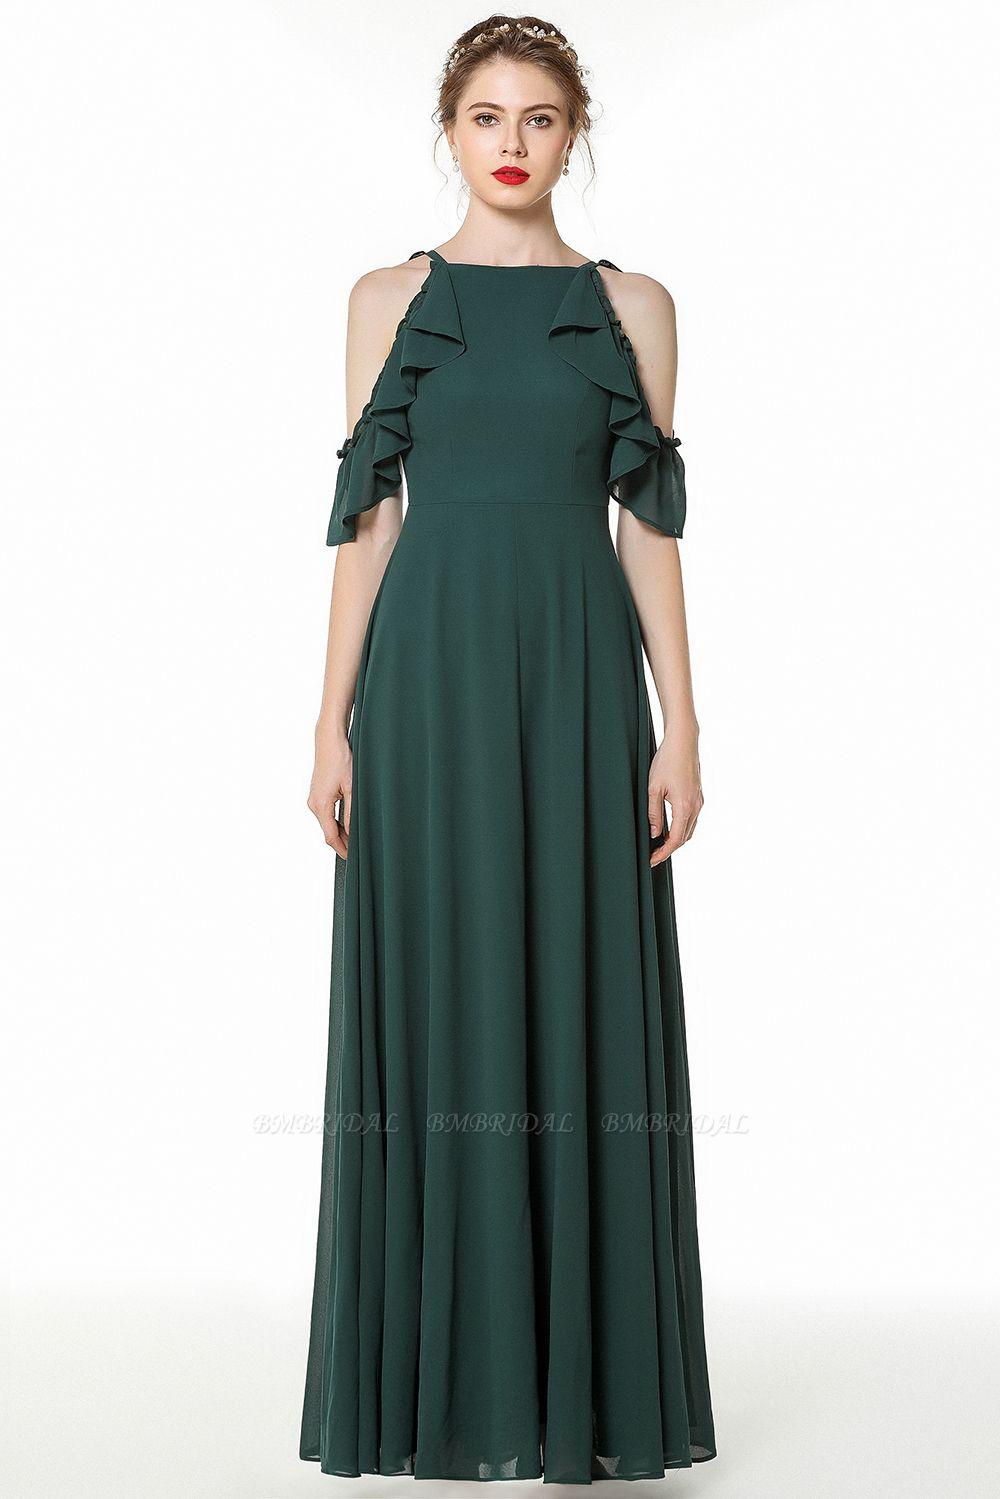 Chic Cold-shoulder Ruffle Dark Green Chiffon Bridesmaid Dresses Online